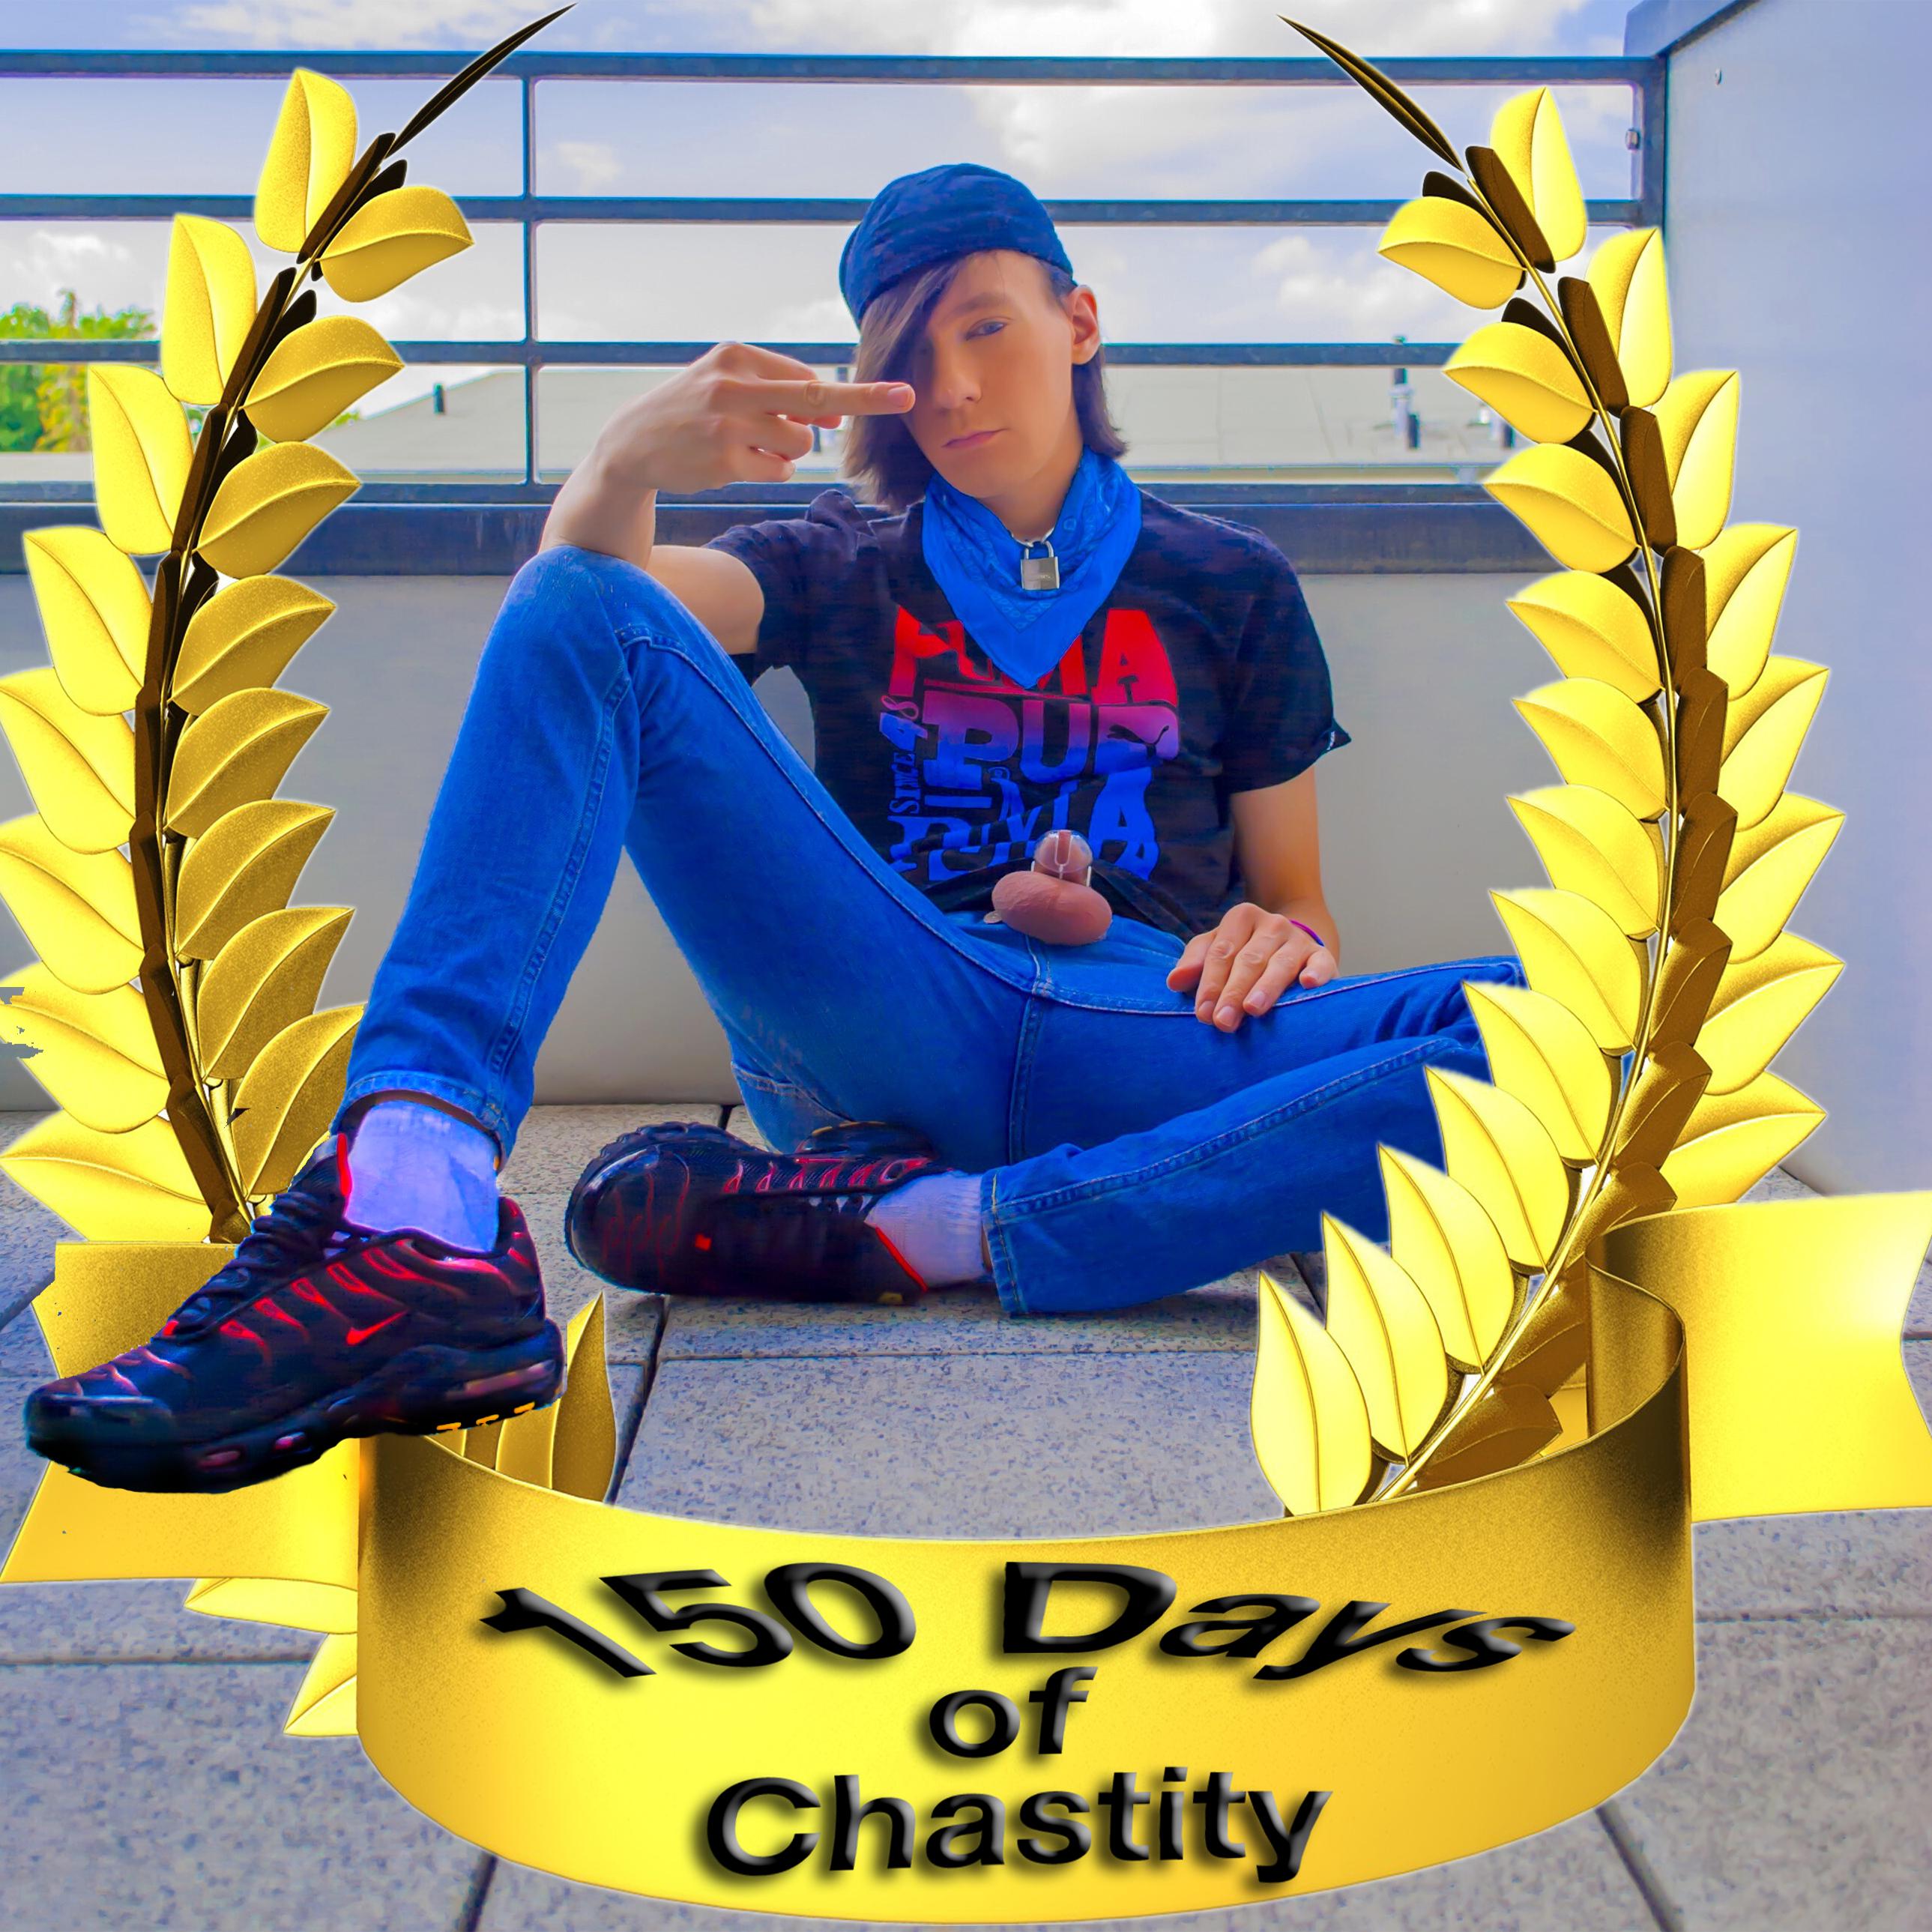 chastity challenge